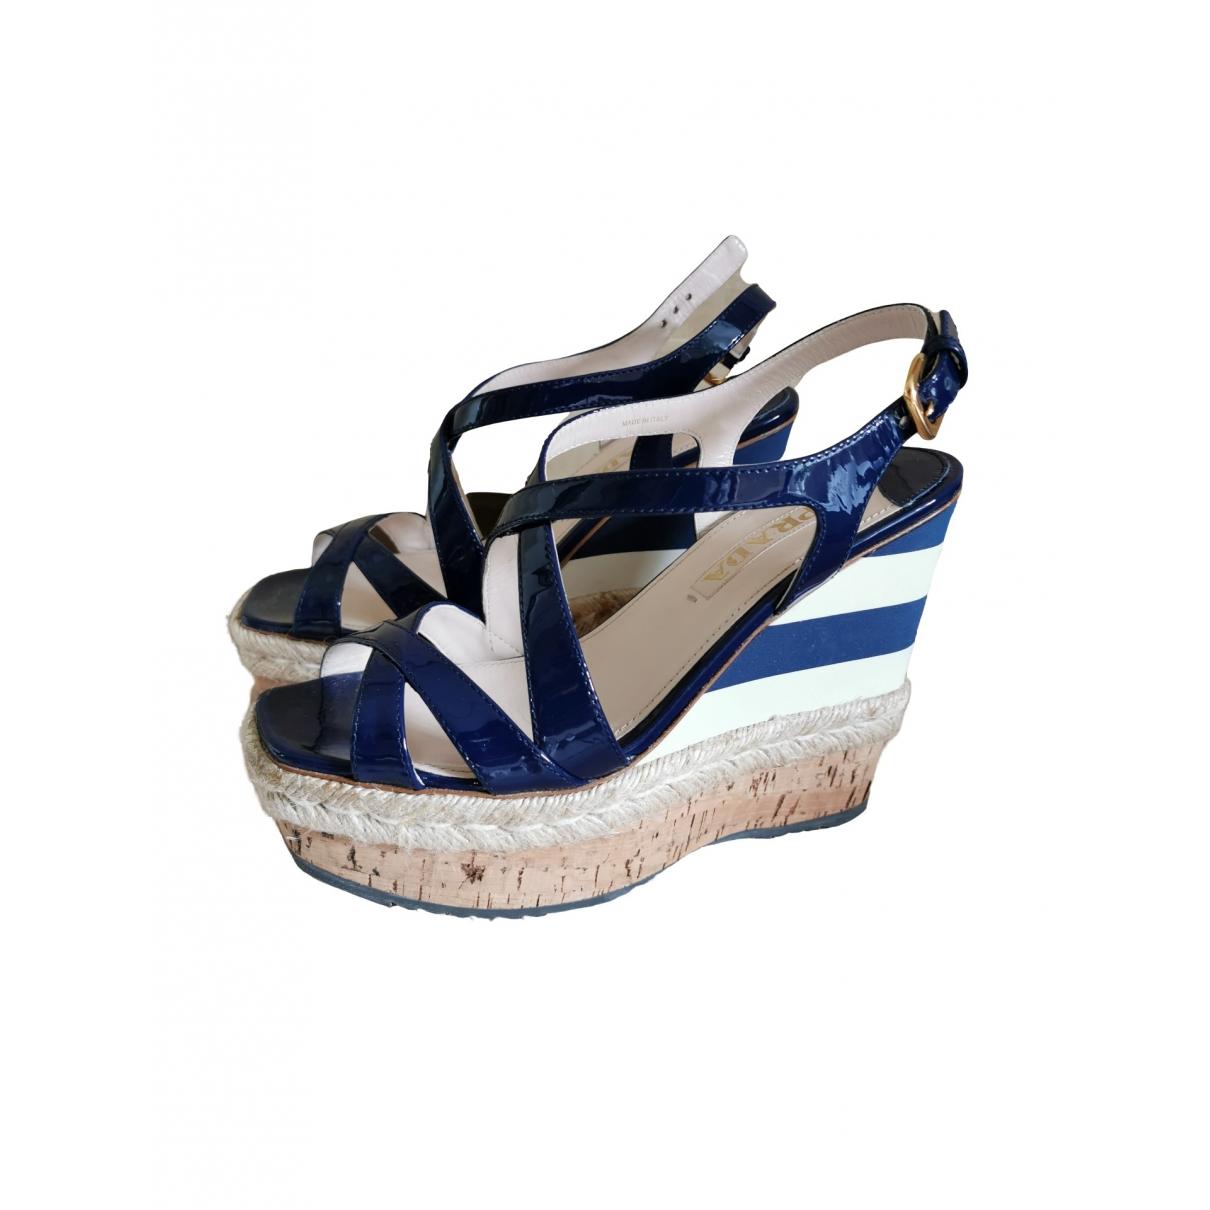 Prada \N Navy Patent leather Sandals for Women 38 EU